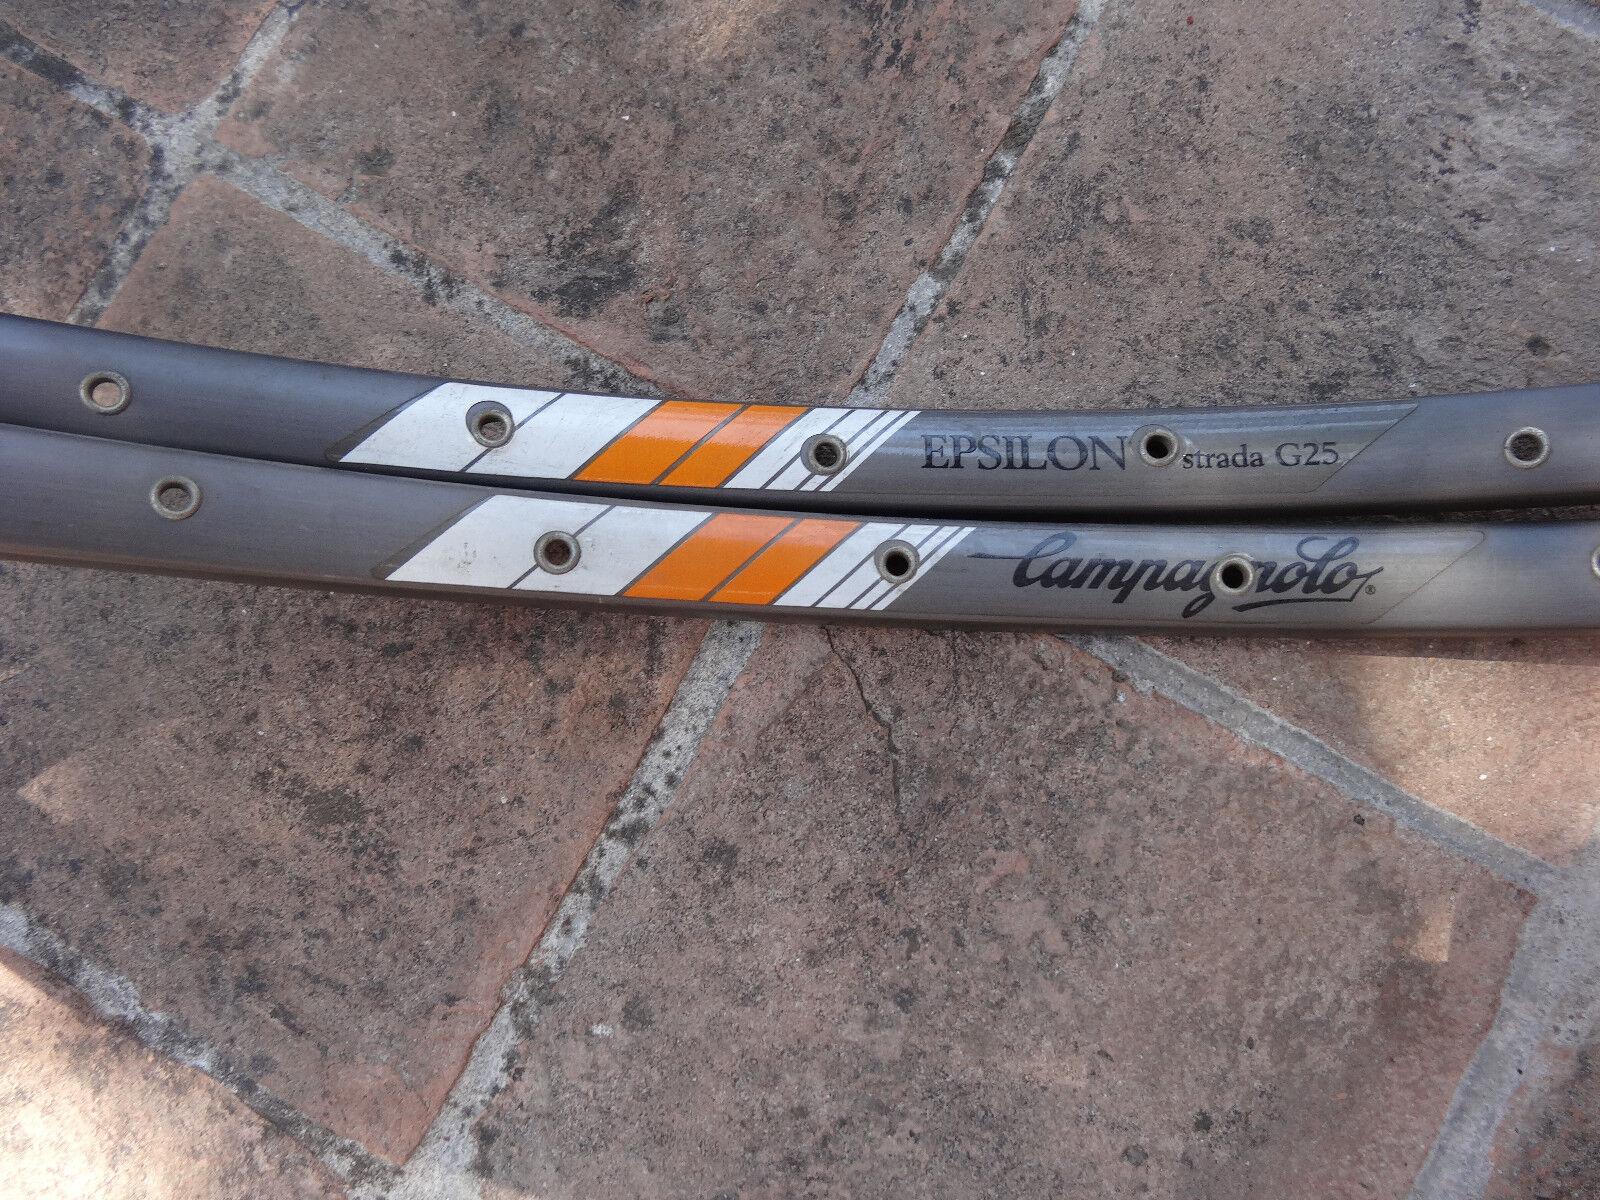 NOS  Campagnolo Epsilon strada G25 pair tubulars 32 hole